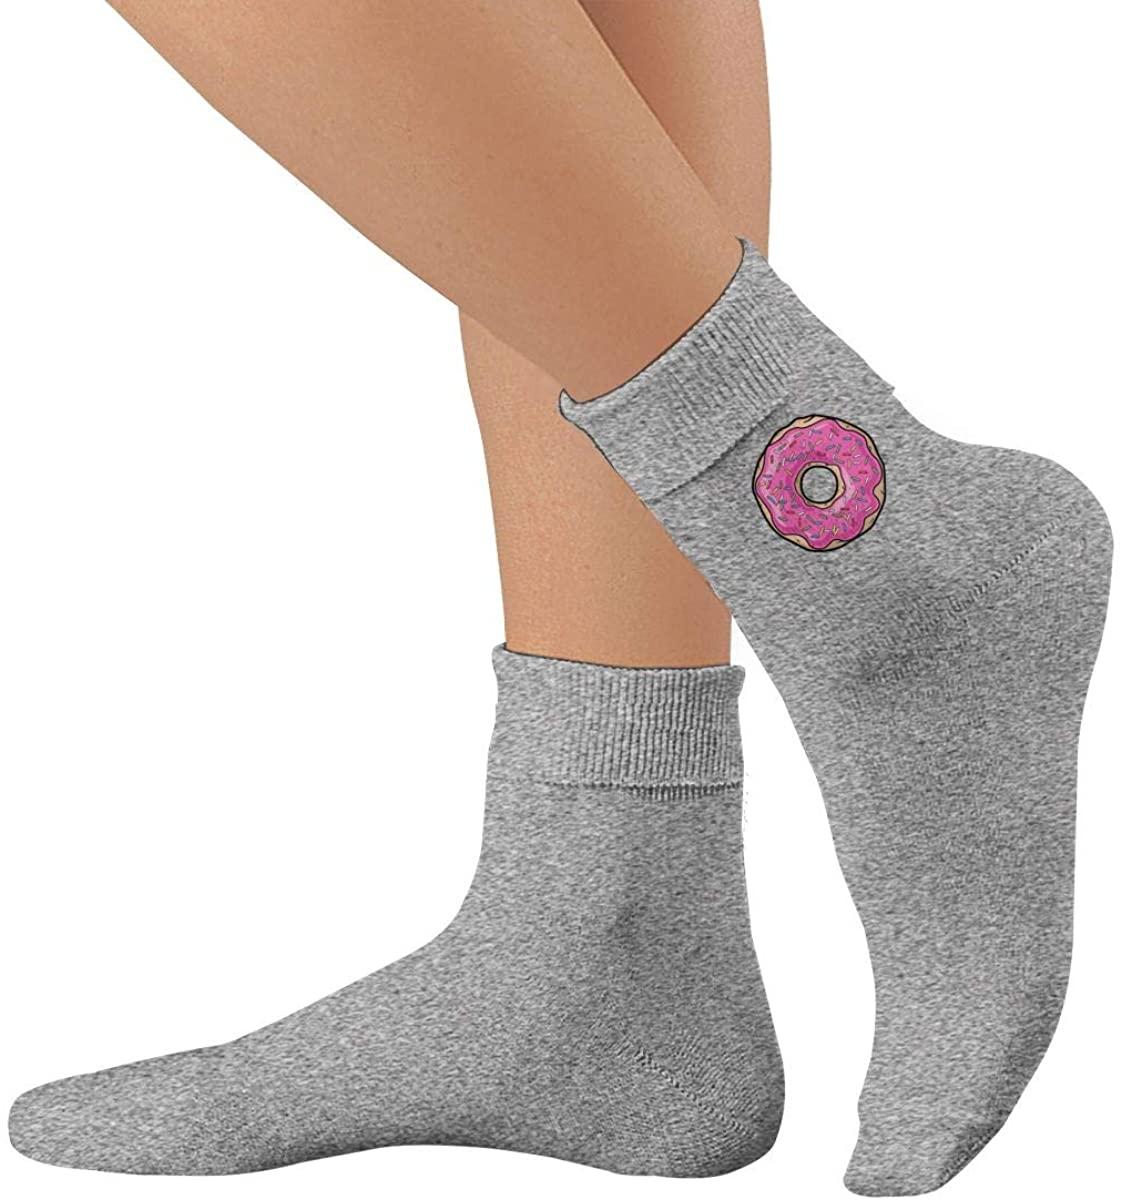 Pink Doughnut Unisex Thin Cotton Lightly High Ankle Socks